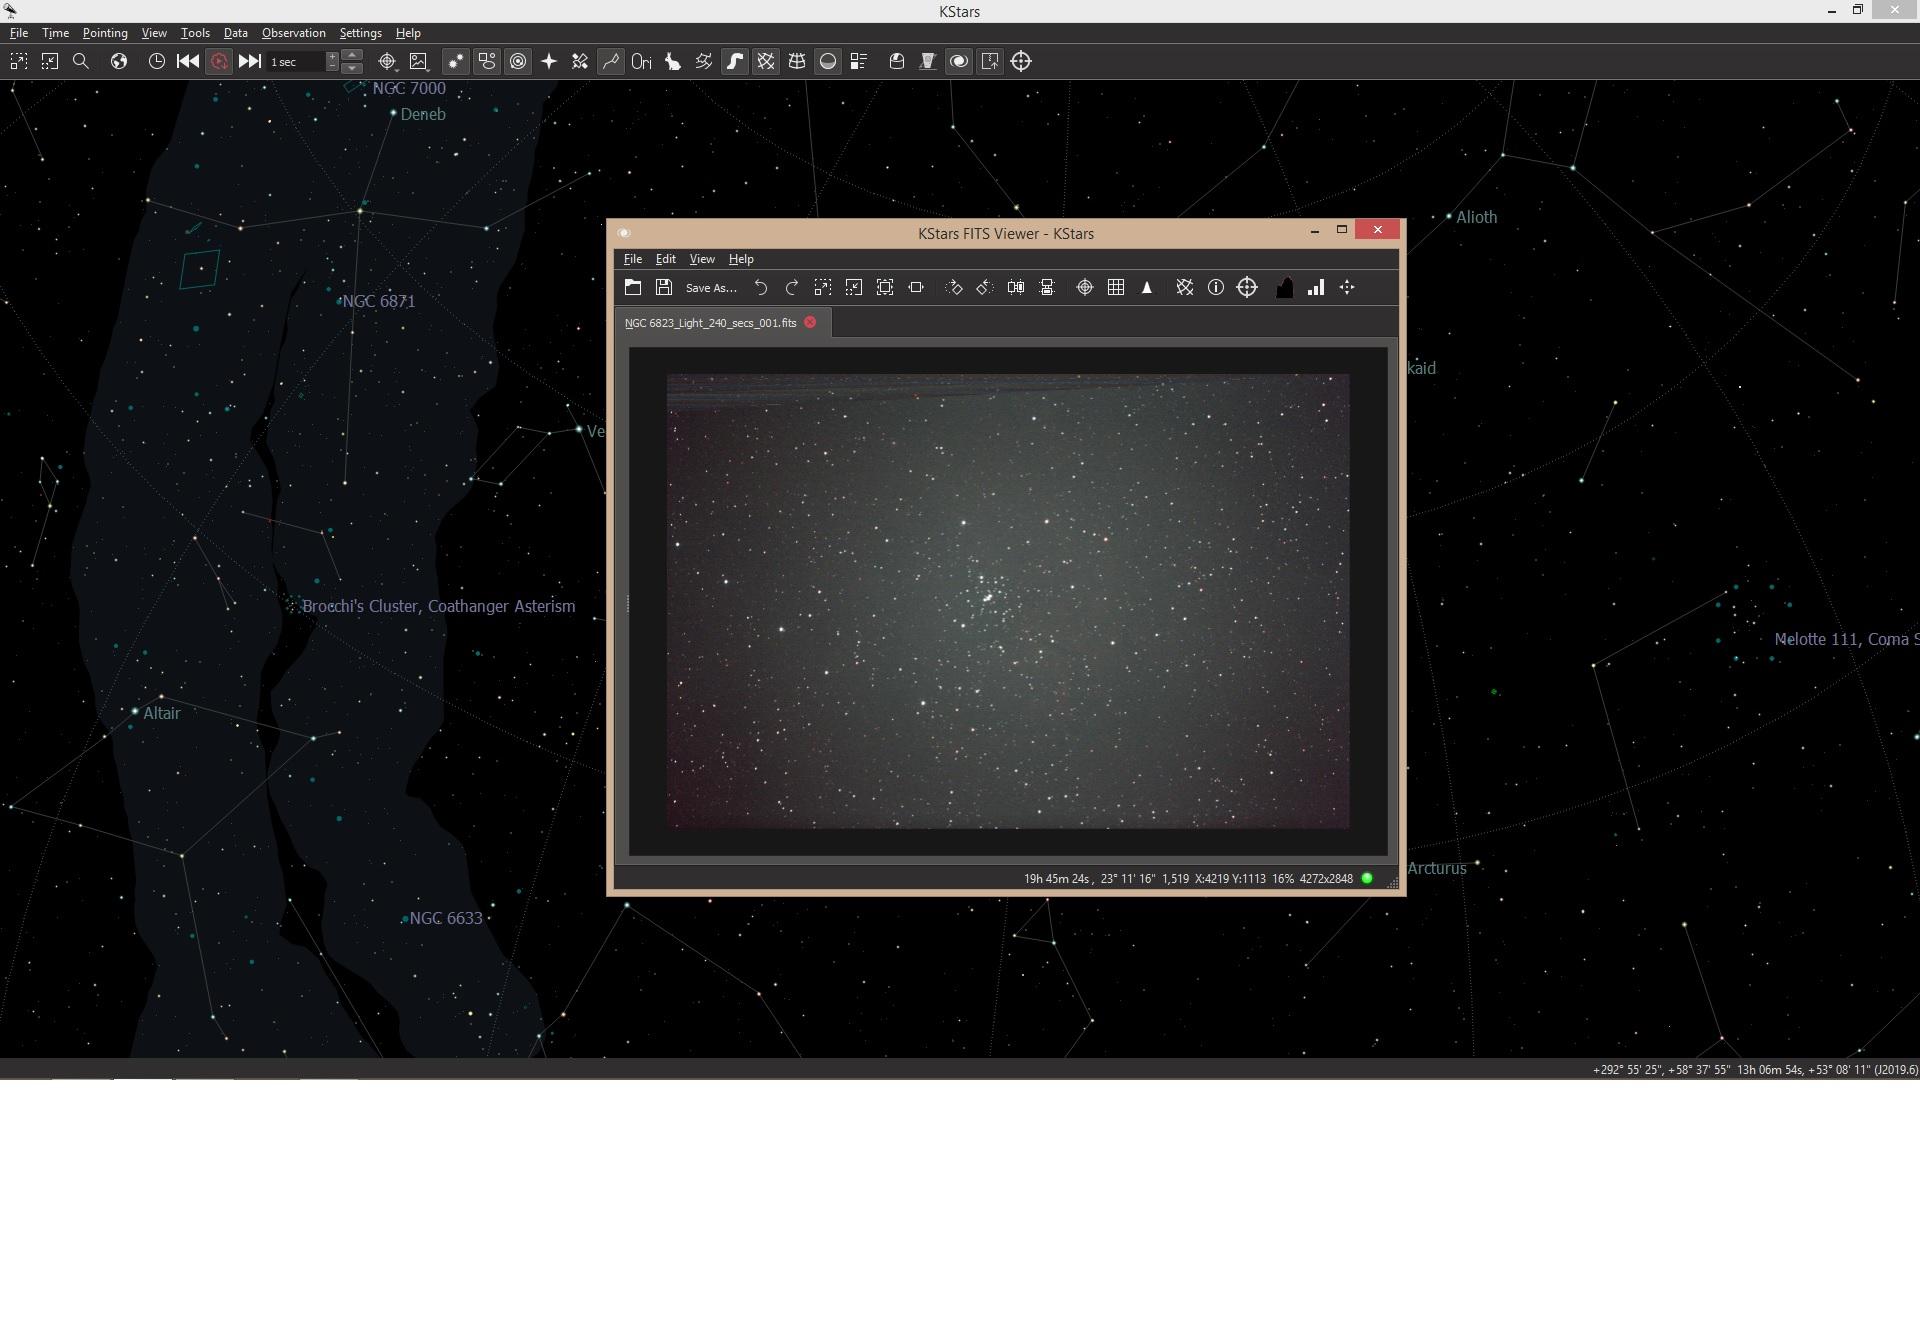 FITSfilecorruptionscreenshot.jpg